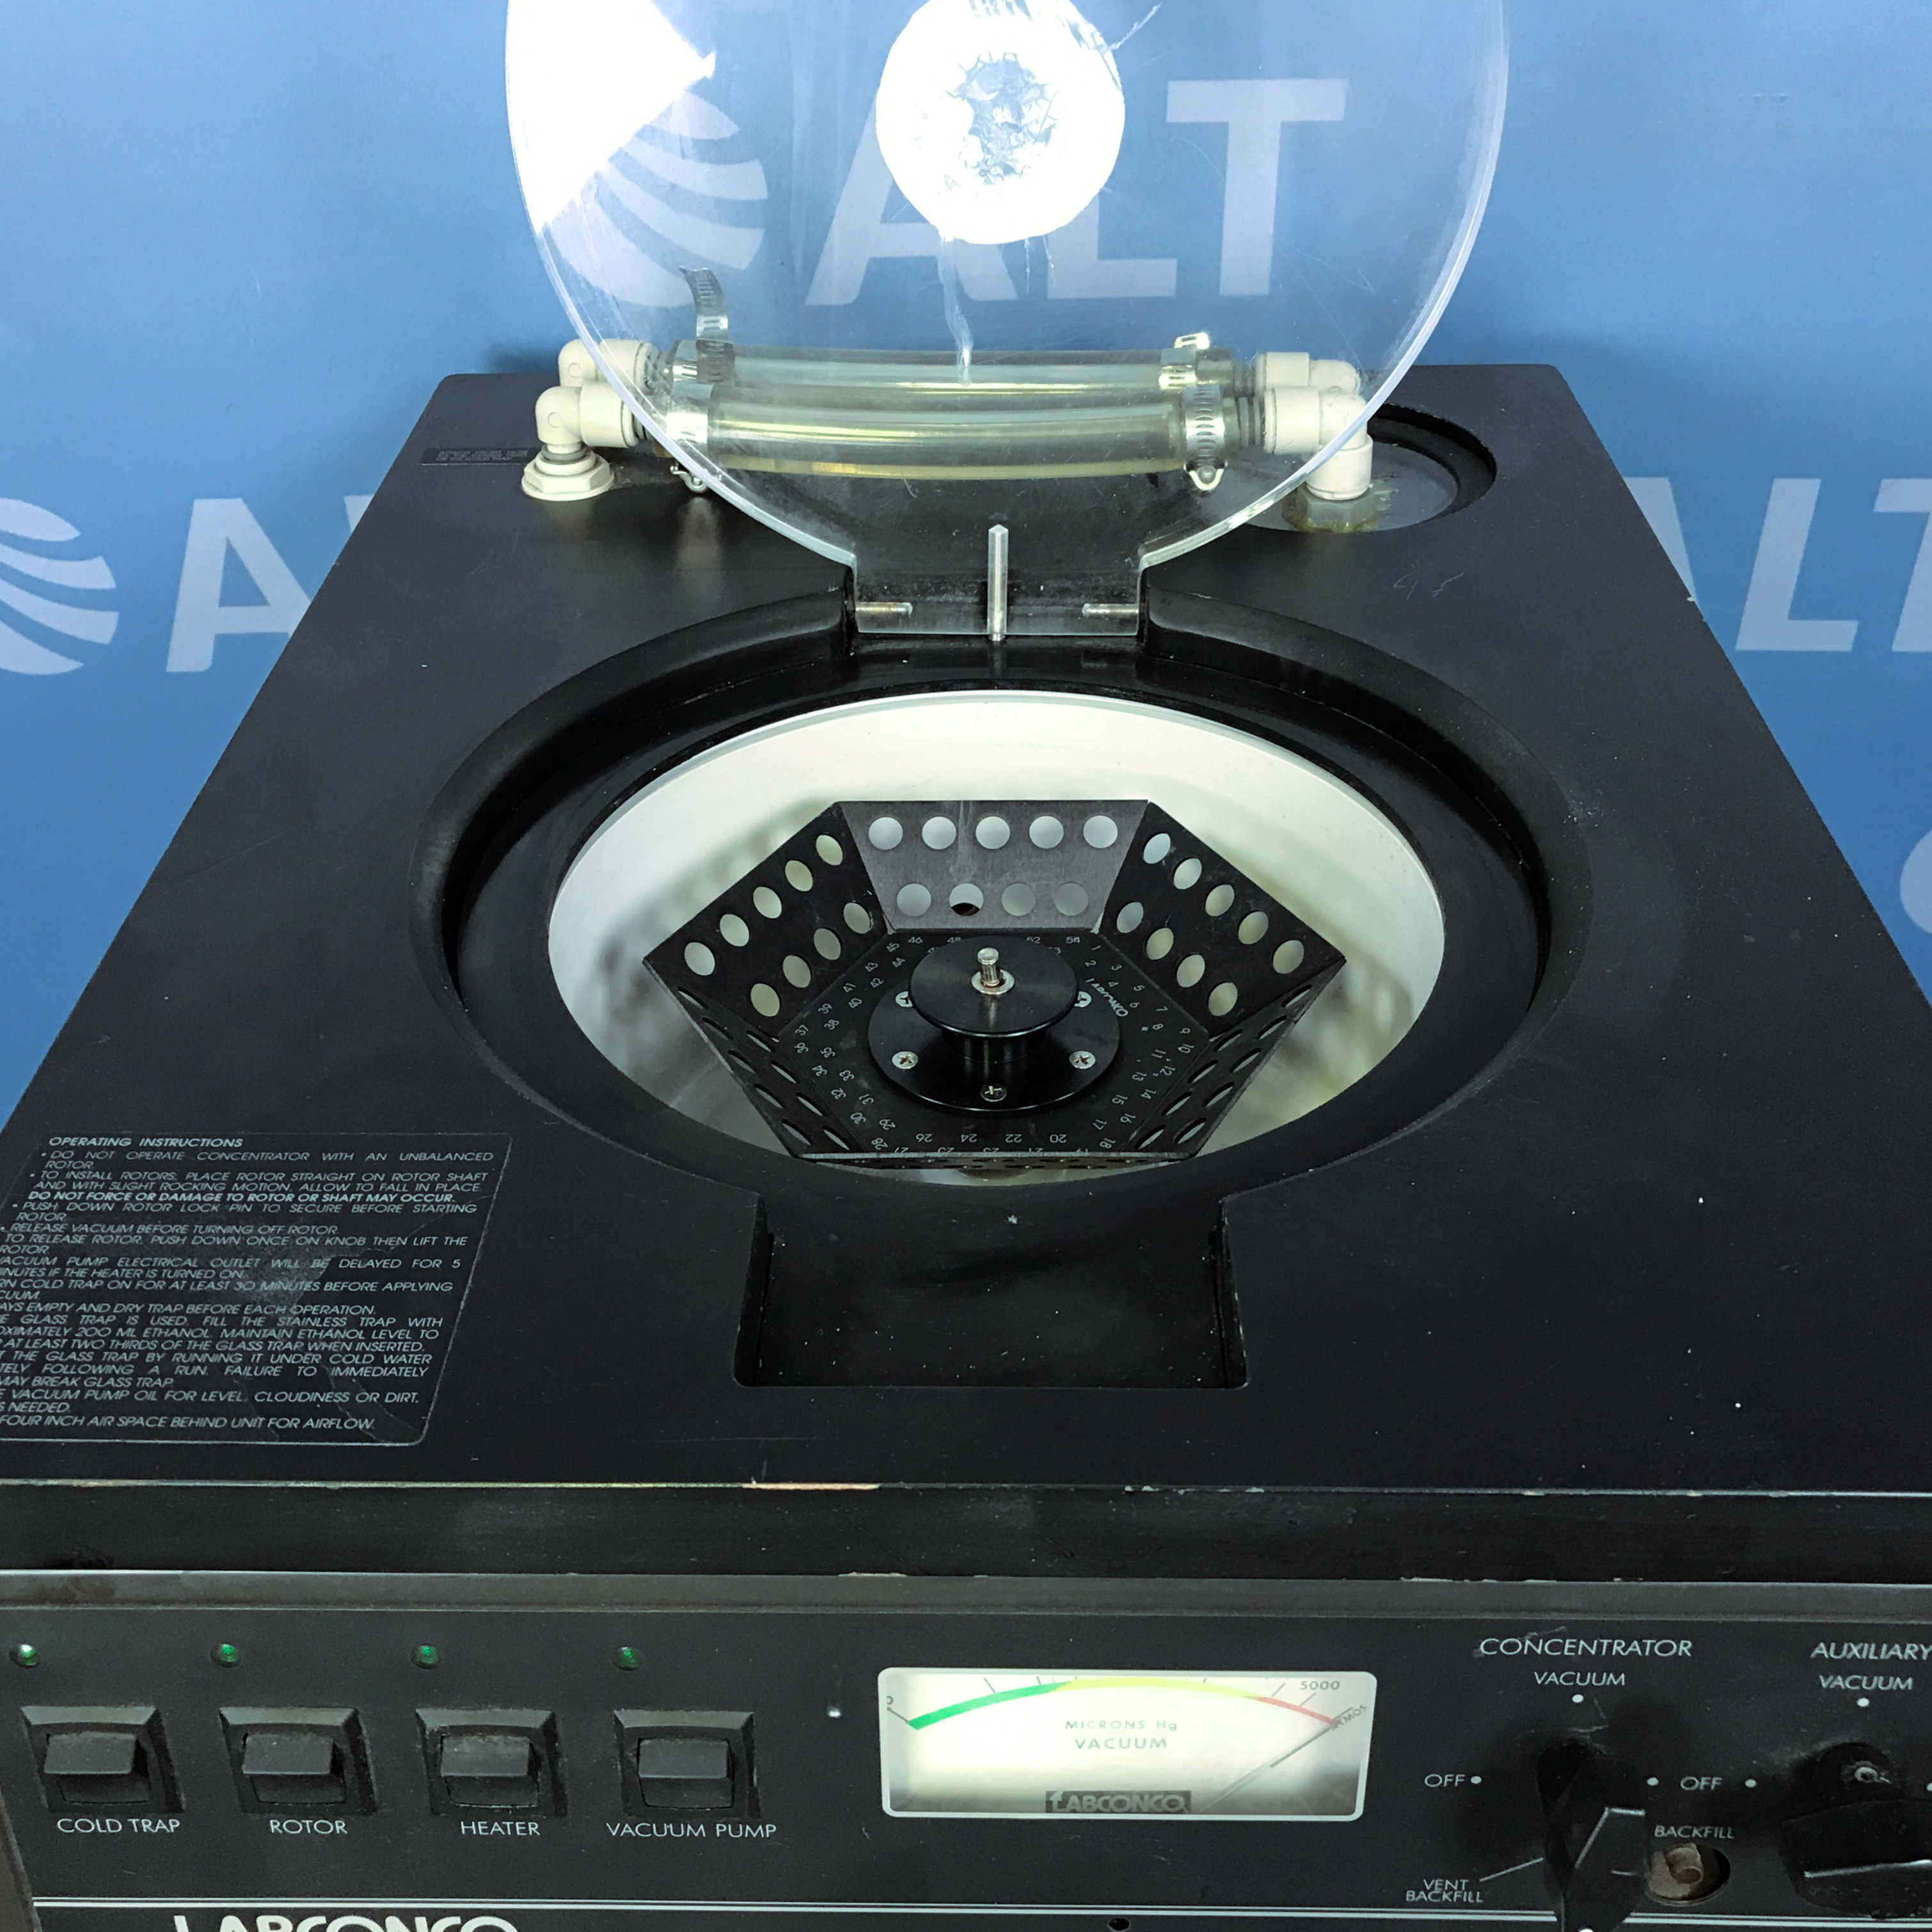 Labconco CentriVap 78120-00 Mobile Centrifugal Concentrator System Image